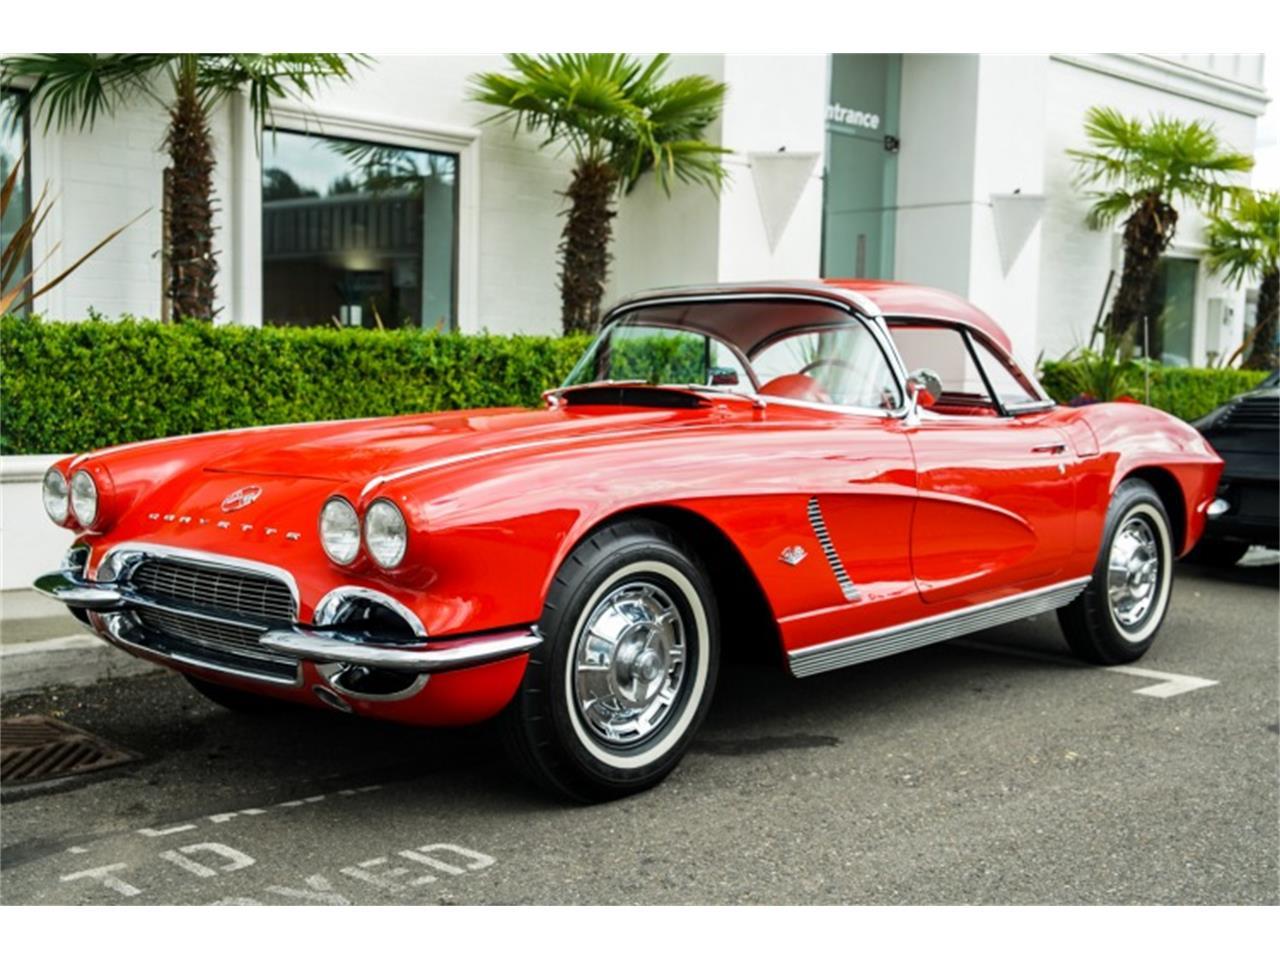 1962 Chevrolet Corvette (CC-1238805) for sale in Sparks, Nevada